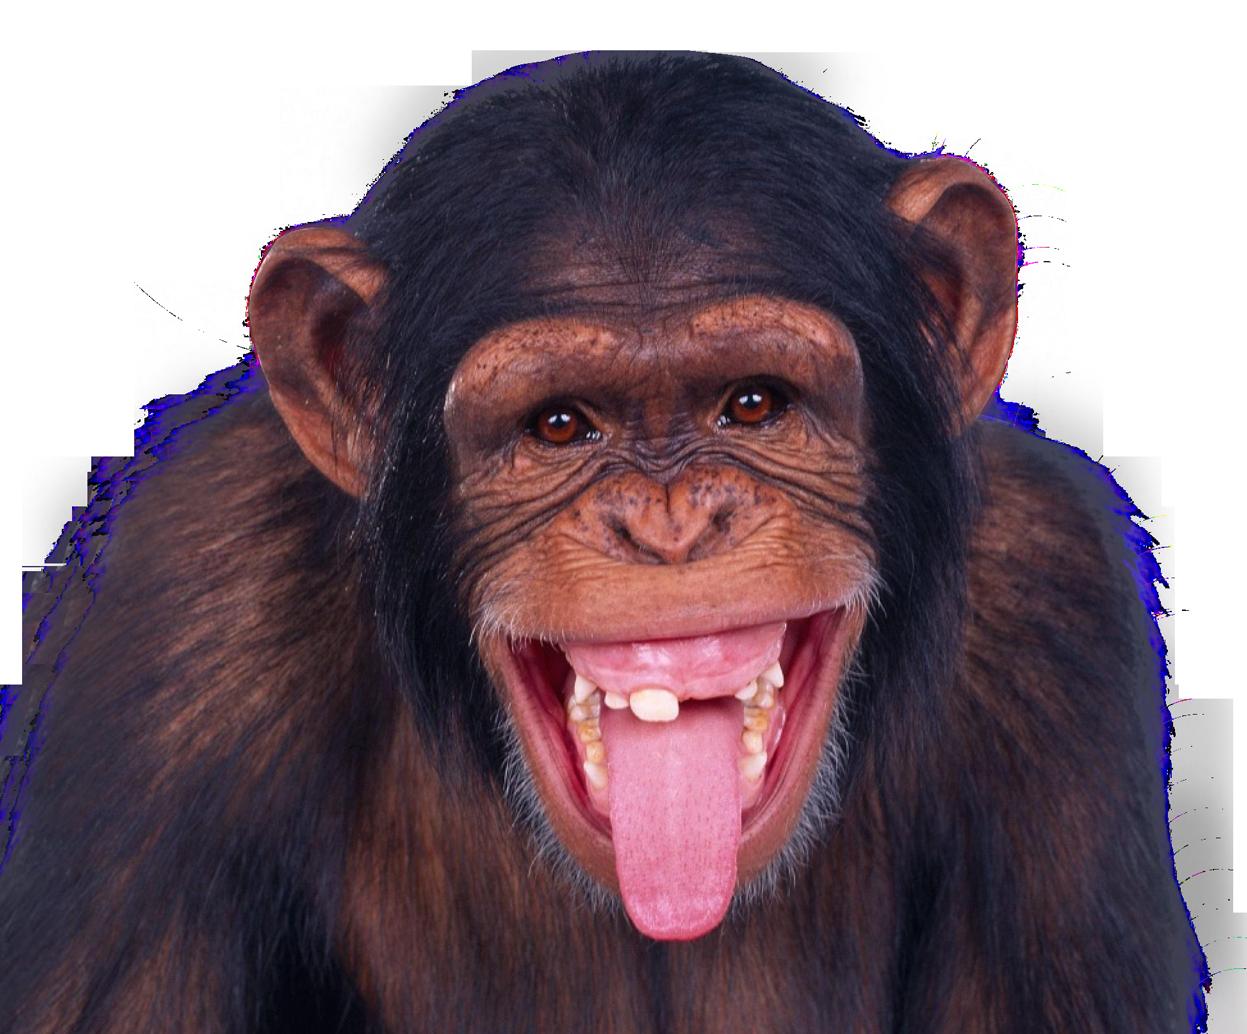 Pngpix monkey transparent image. Funny png images